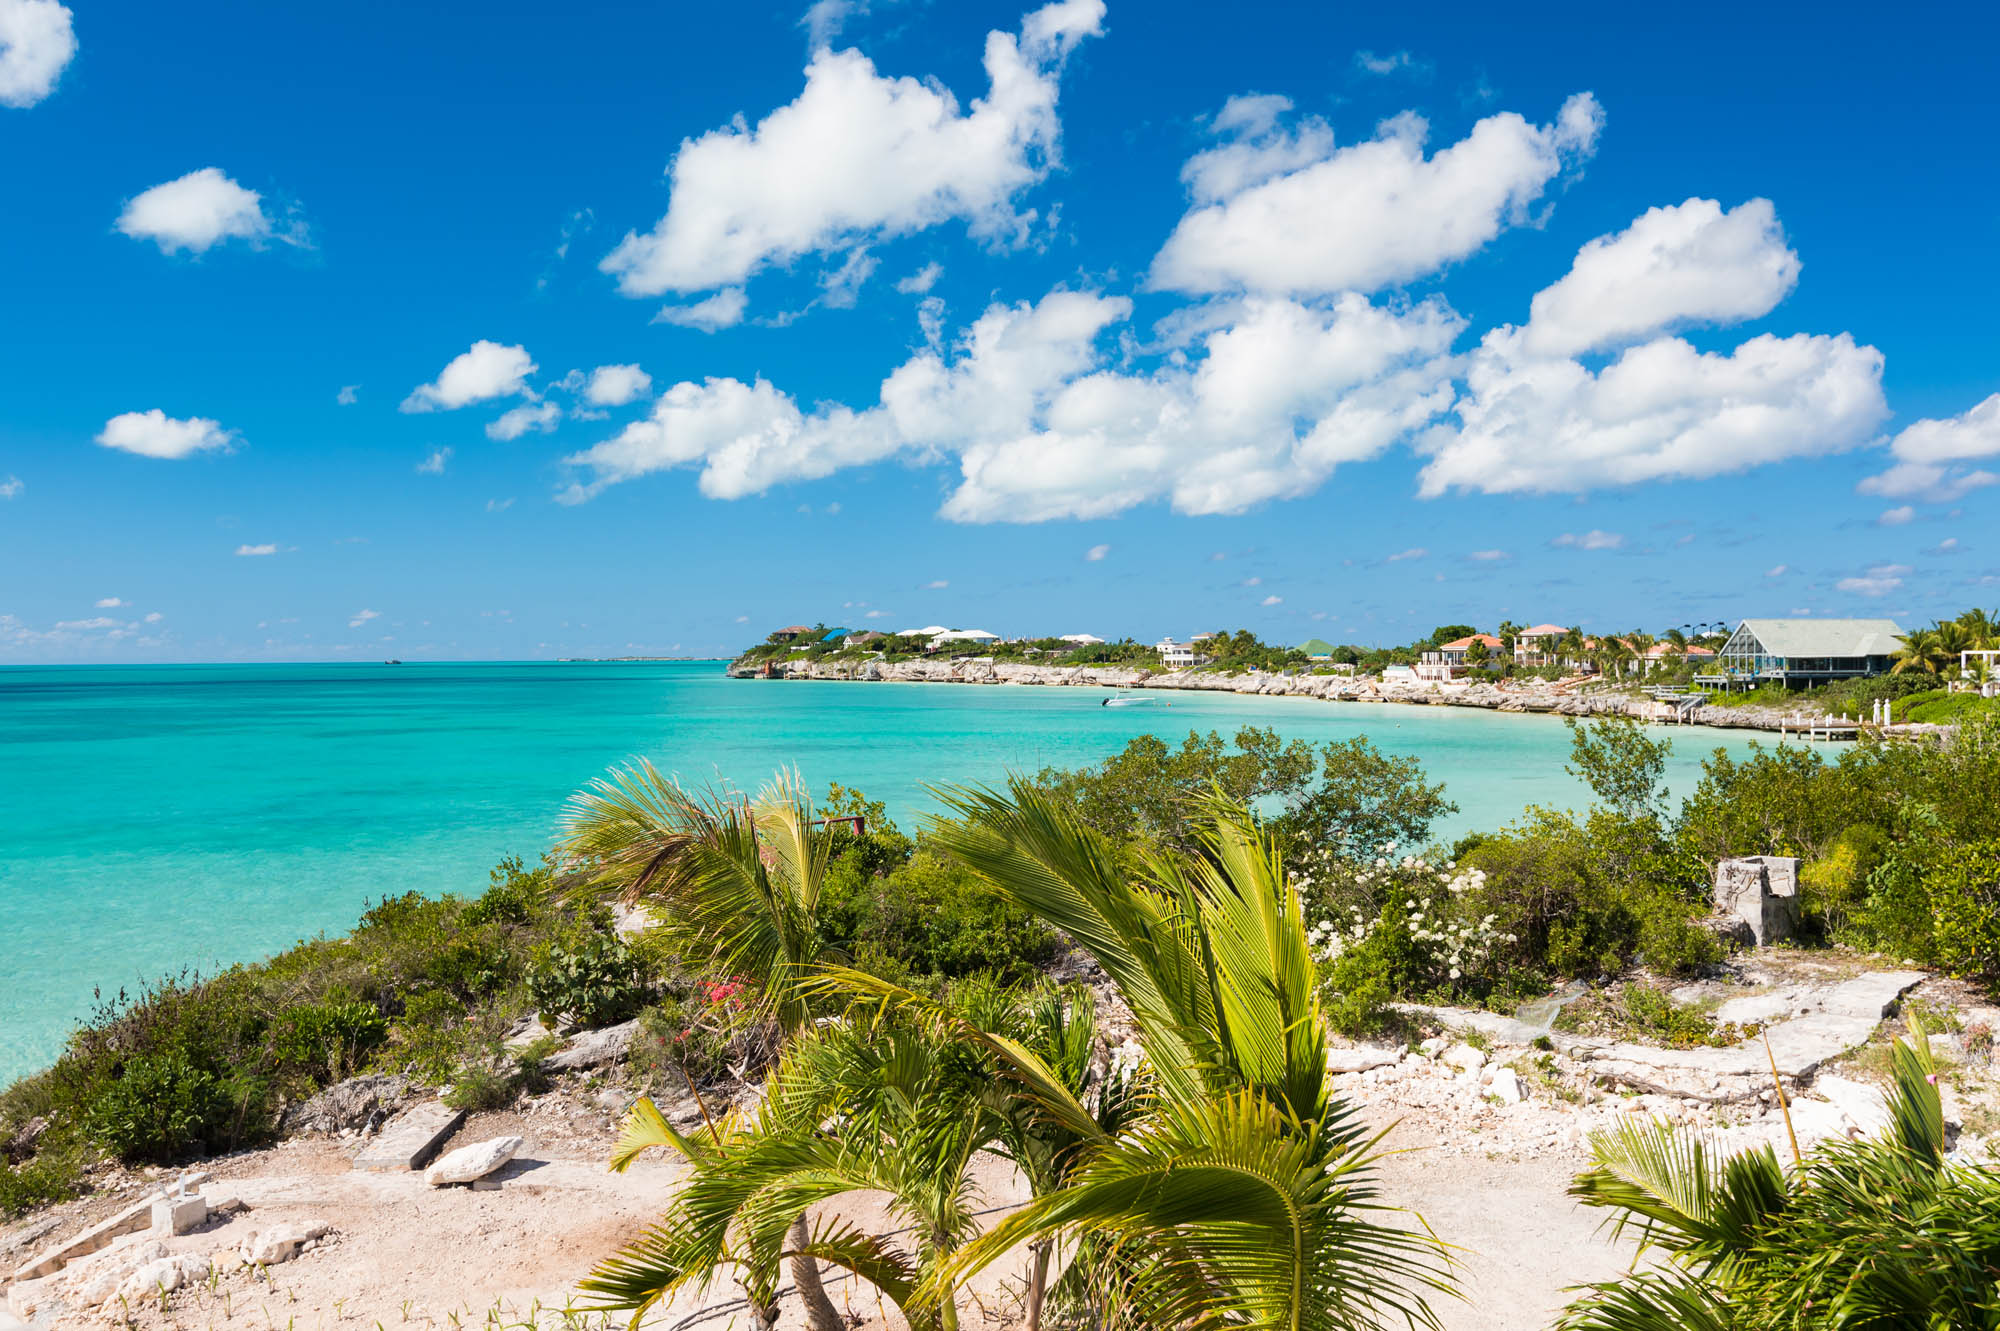 Miami Vice One Near Sapodilla Bay Providenciales Turks